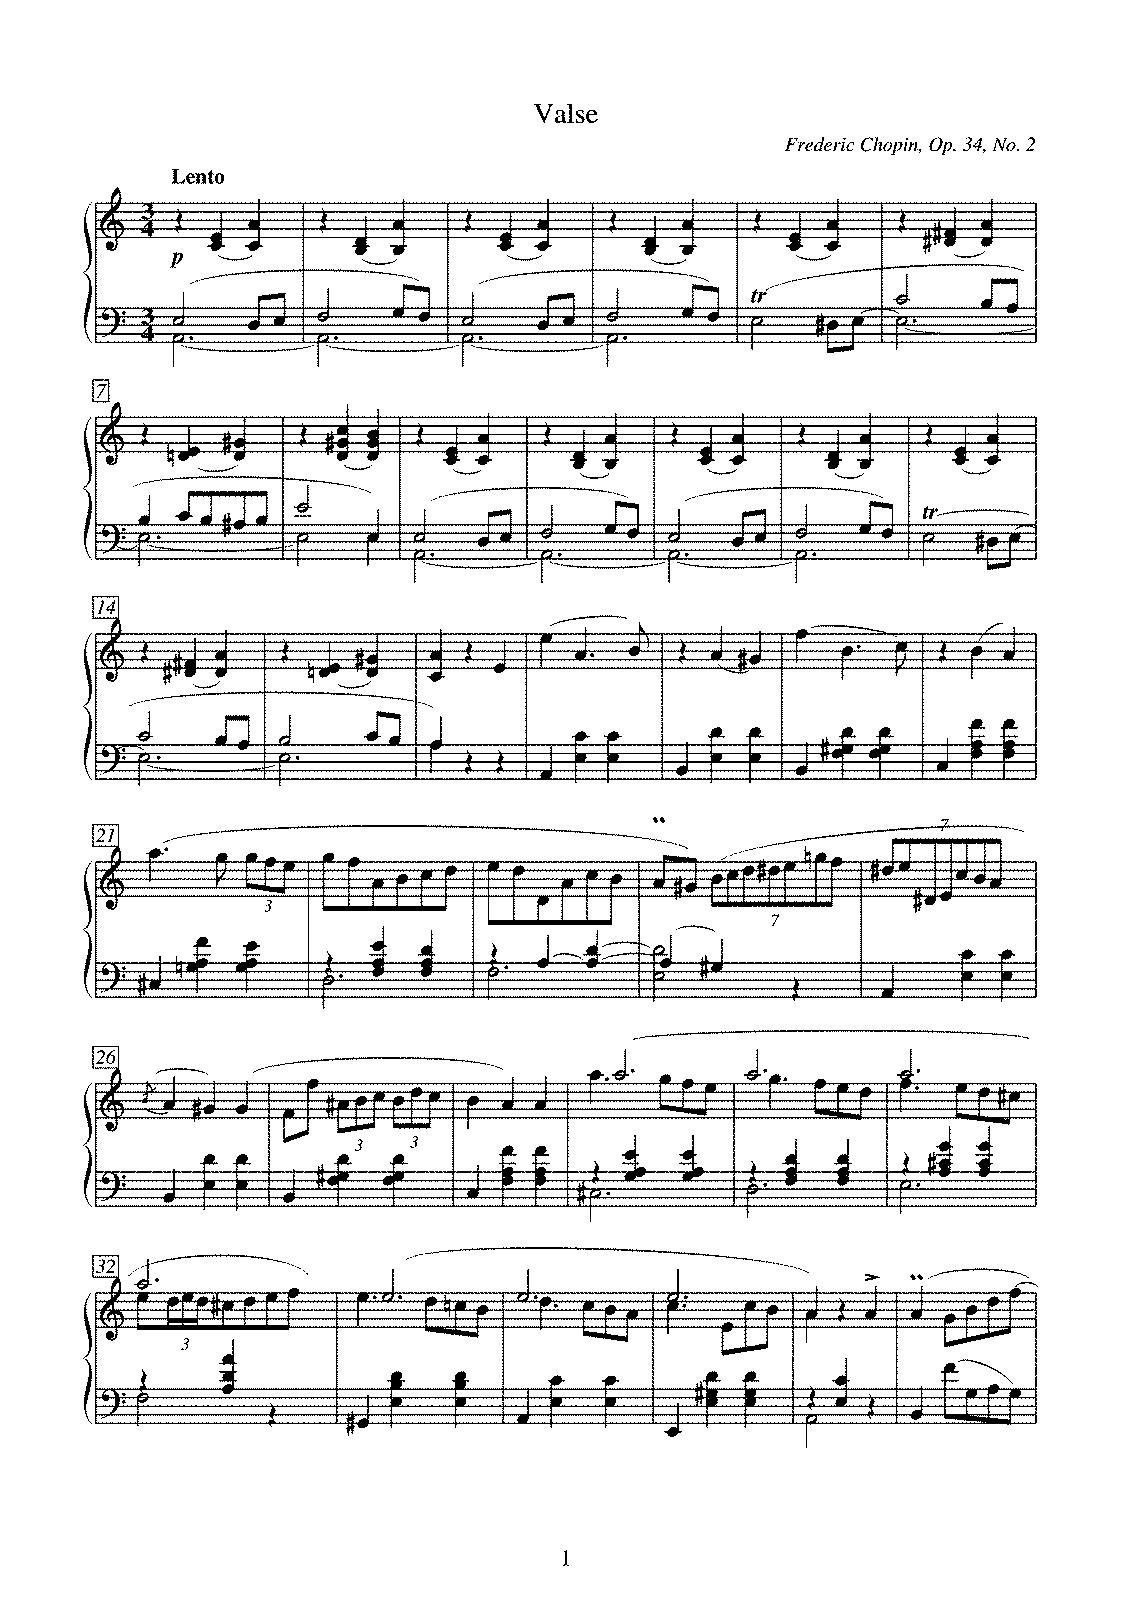 nocturne op 9 no 2 tab pdf